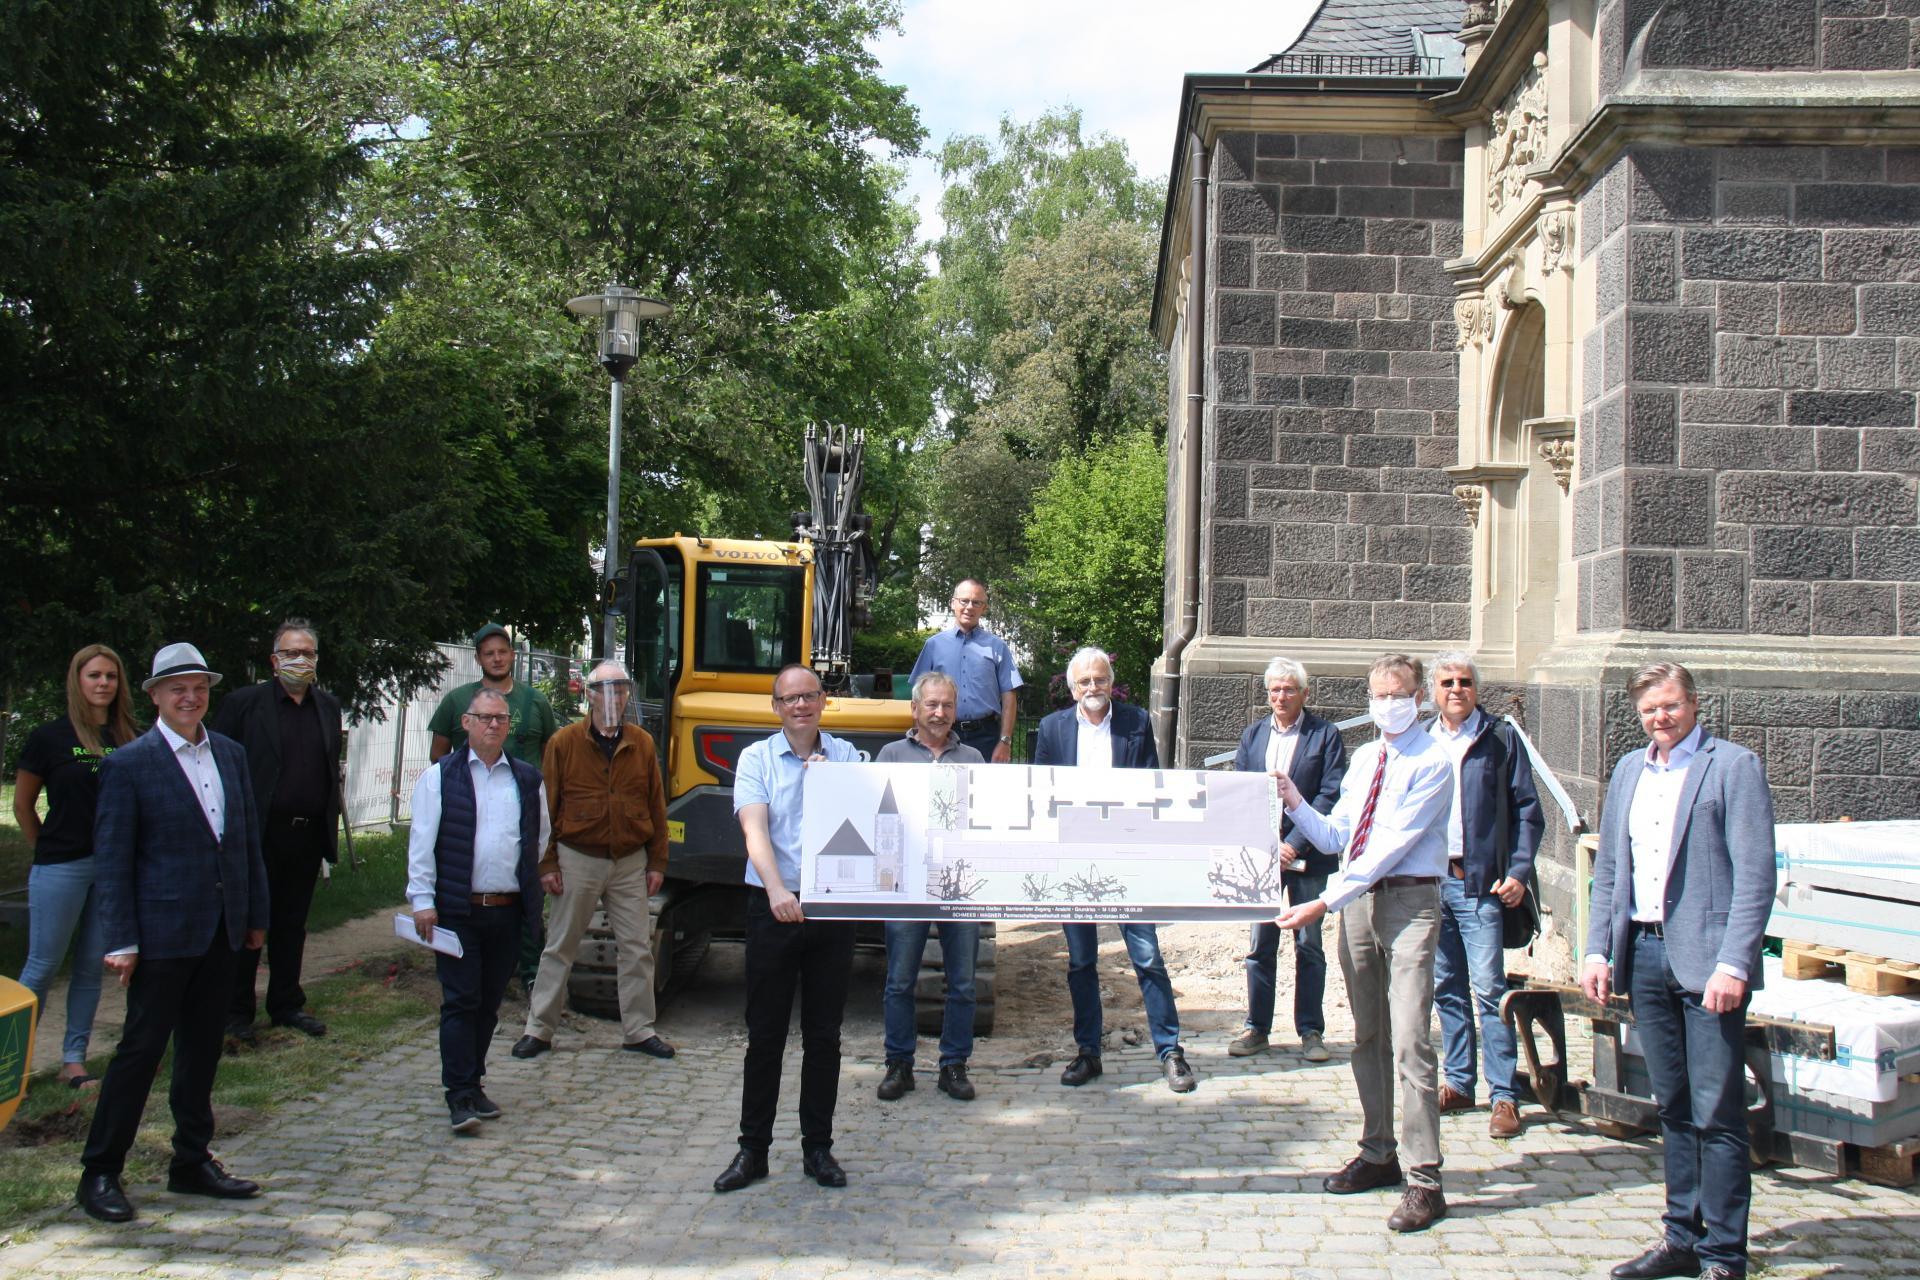 Bild der Meldung: Neuer barrierefreier Zugang zur Johanneskirche – Beginn der Bauarbeiten am 20. Mai 2020